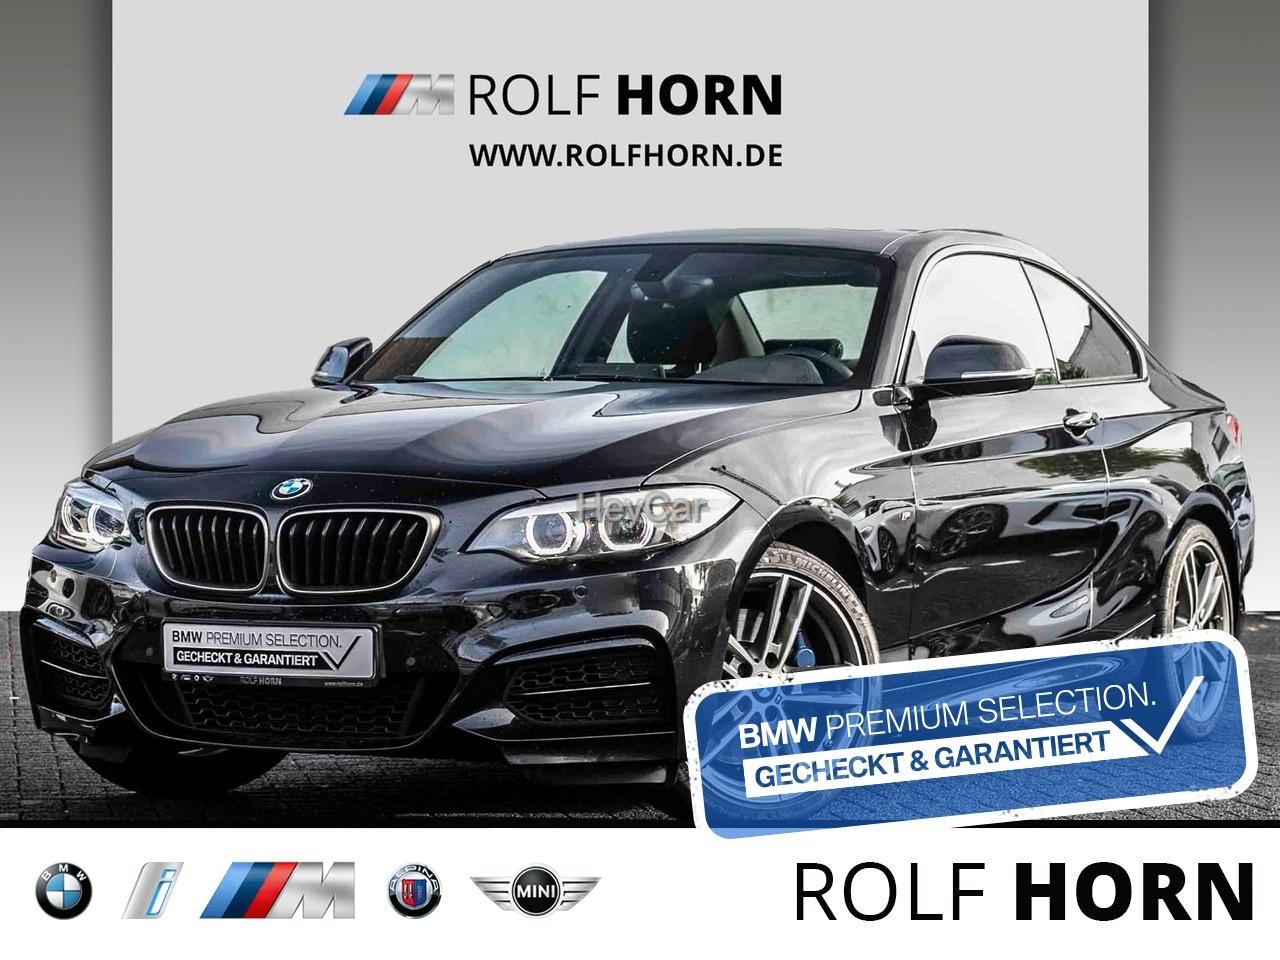 BMW M240i Coupe Navi PDC LED harman/kardon Glasdach, Jahr 2020, Benzin